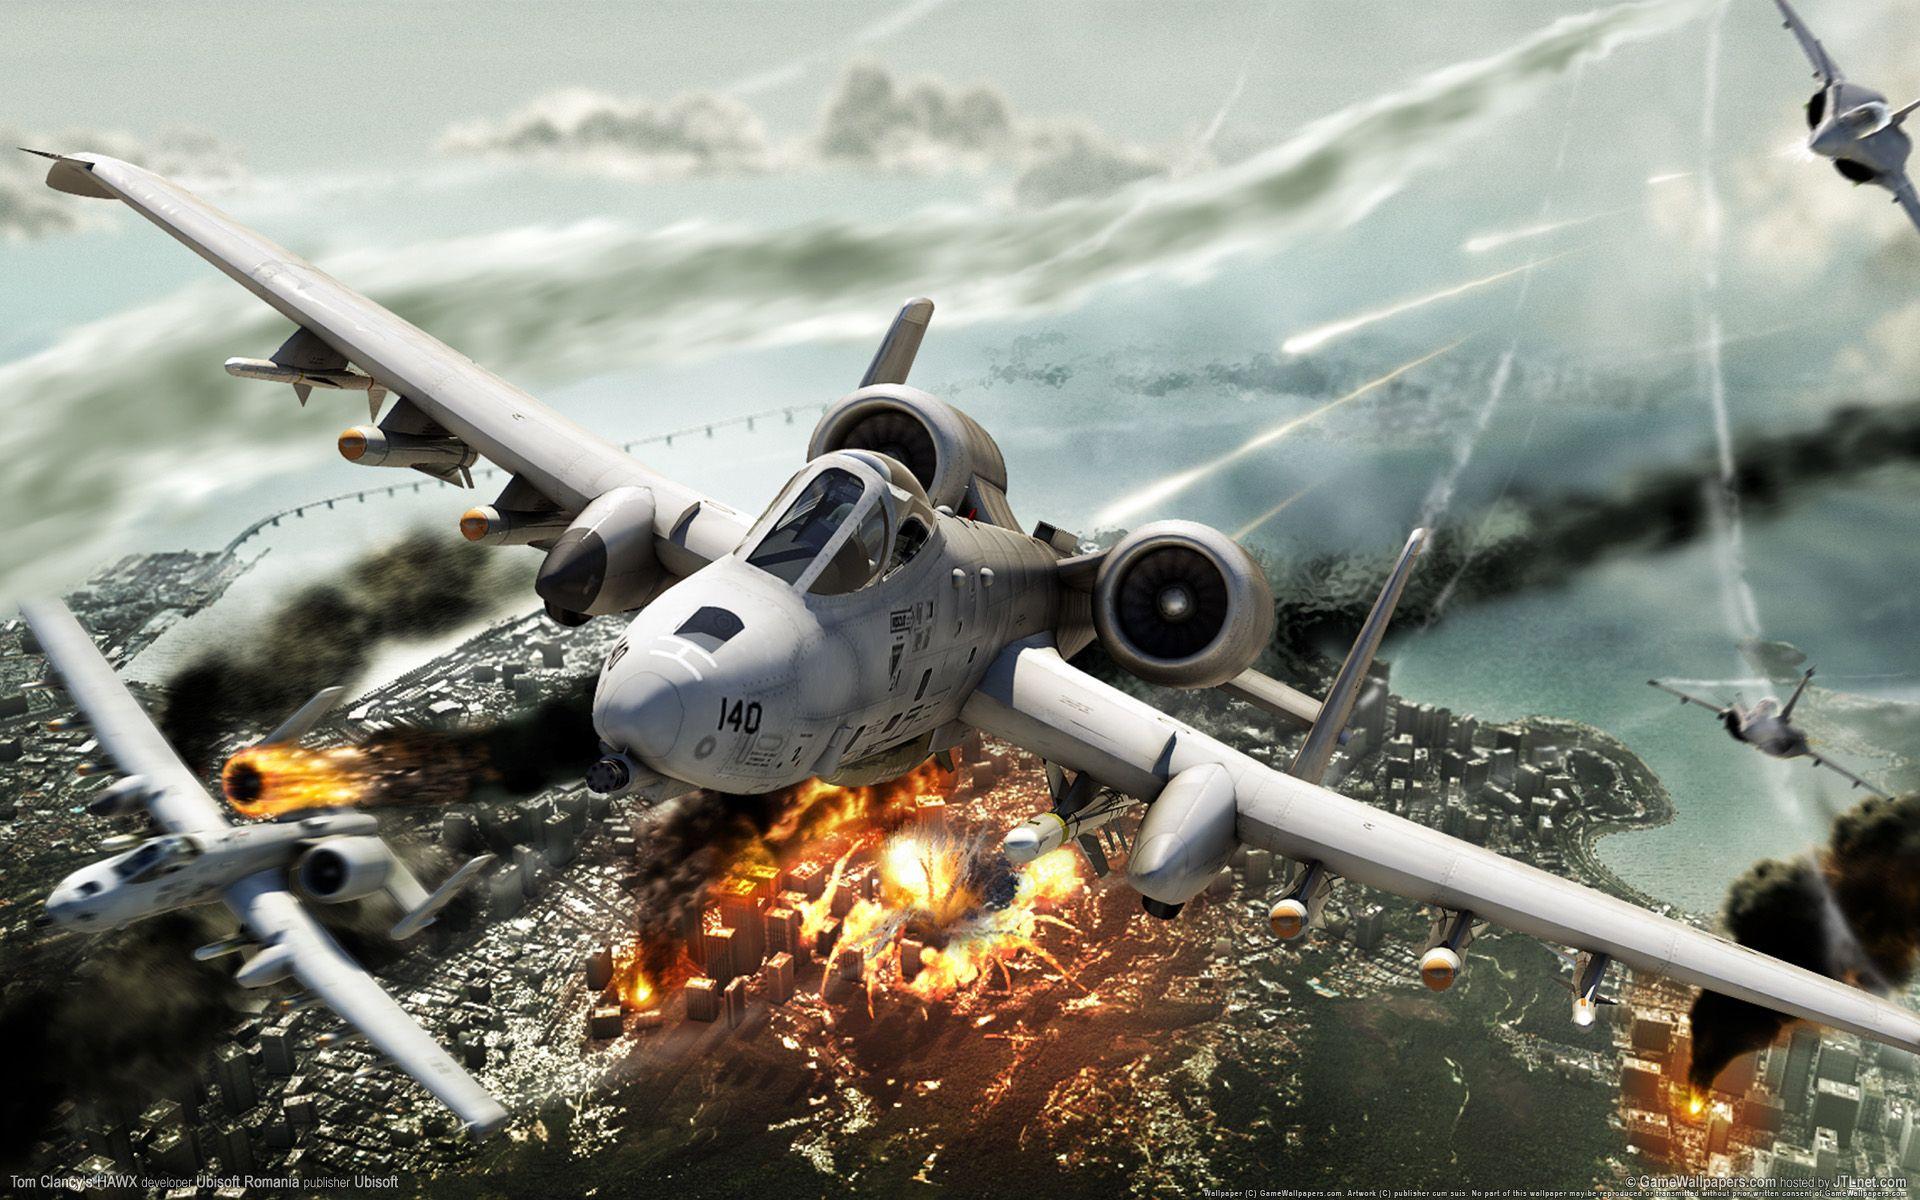 Tom Clancy's HAWX   Art: Video Games   Fighter jets